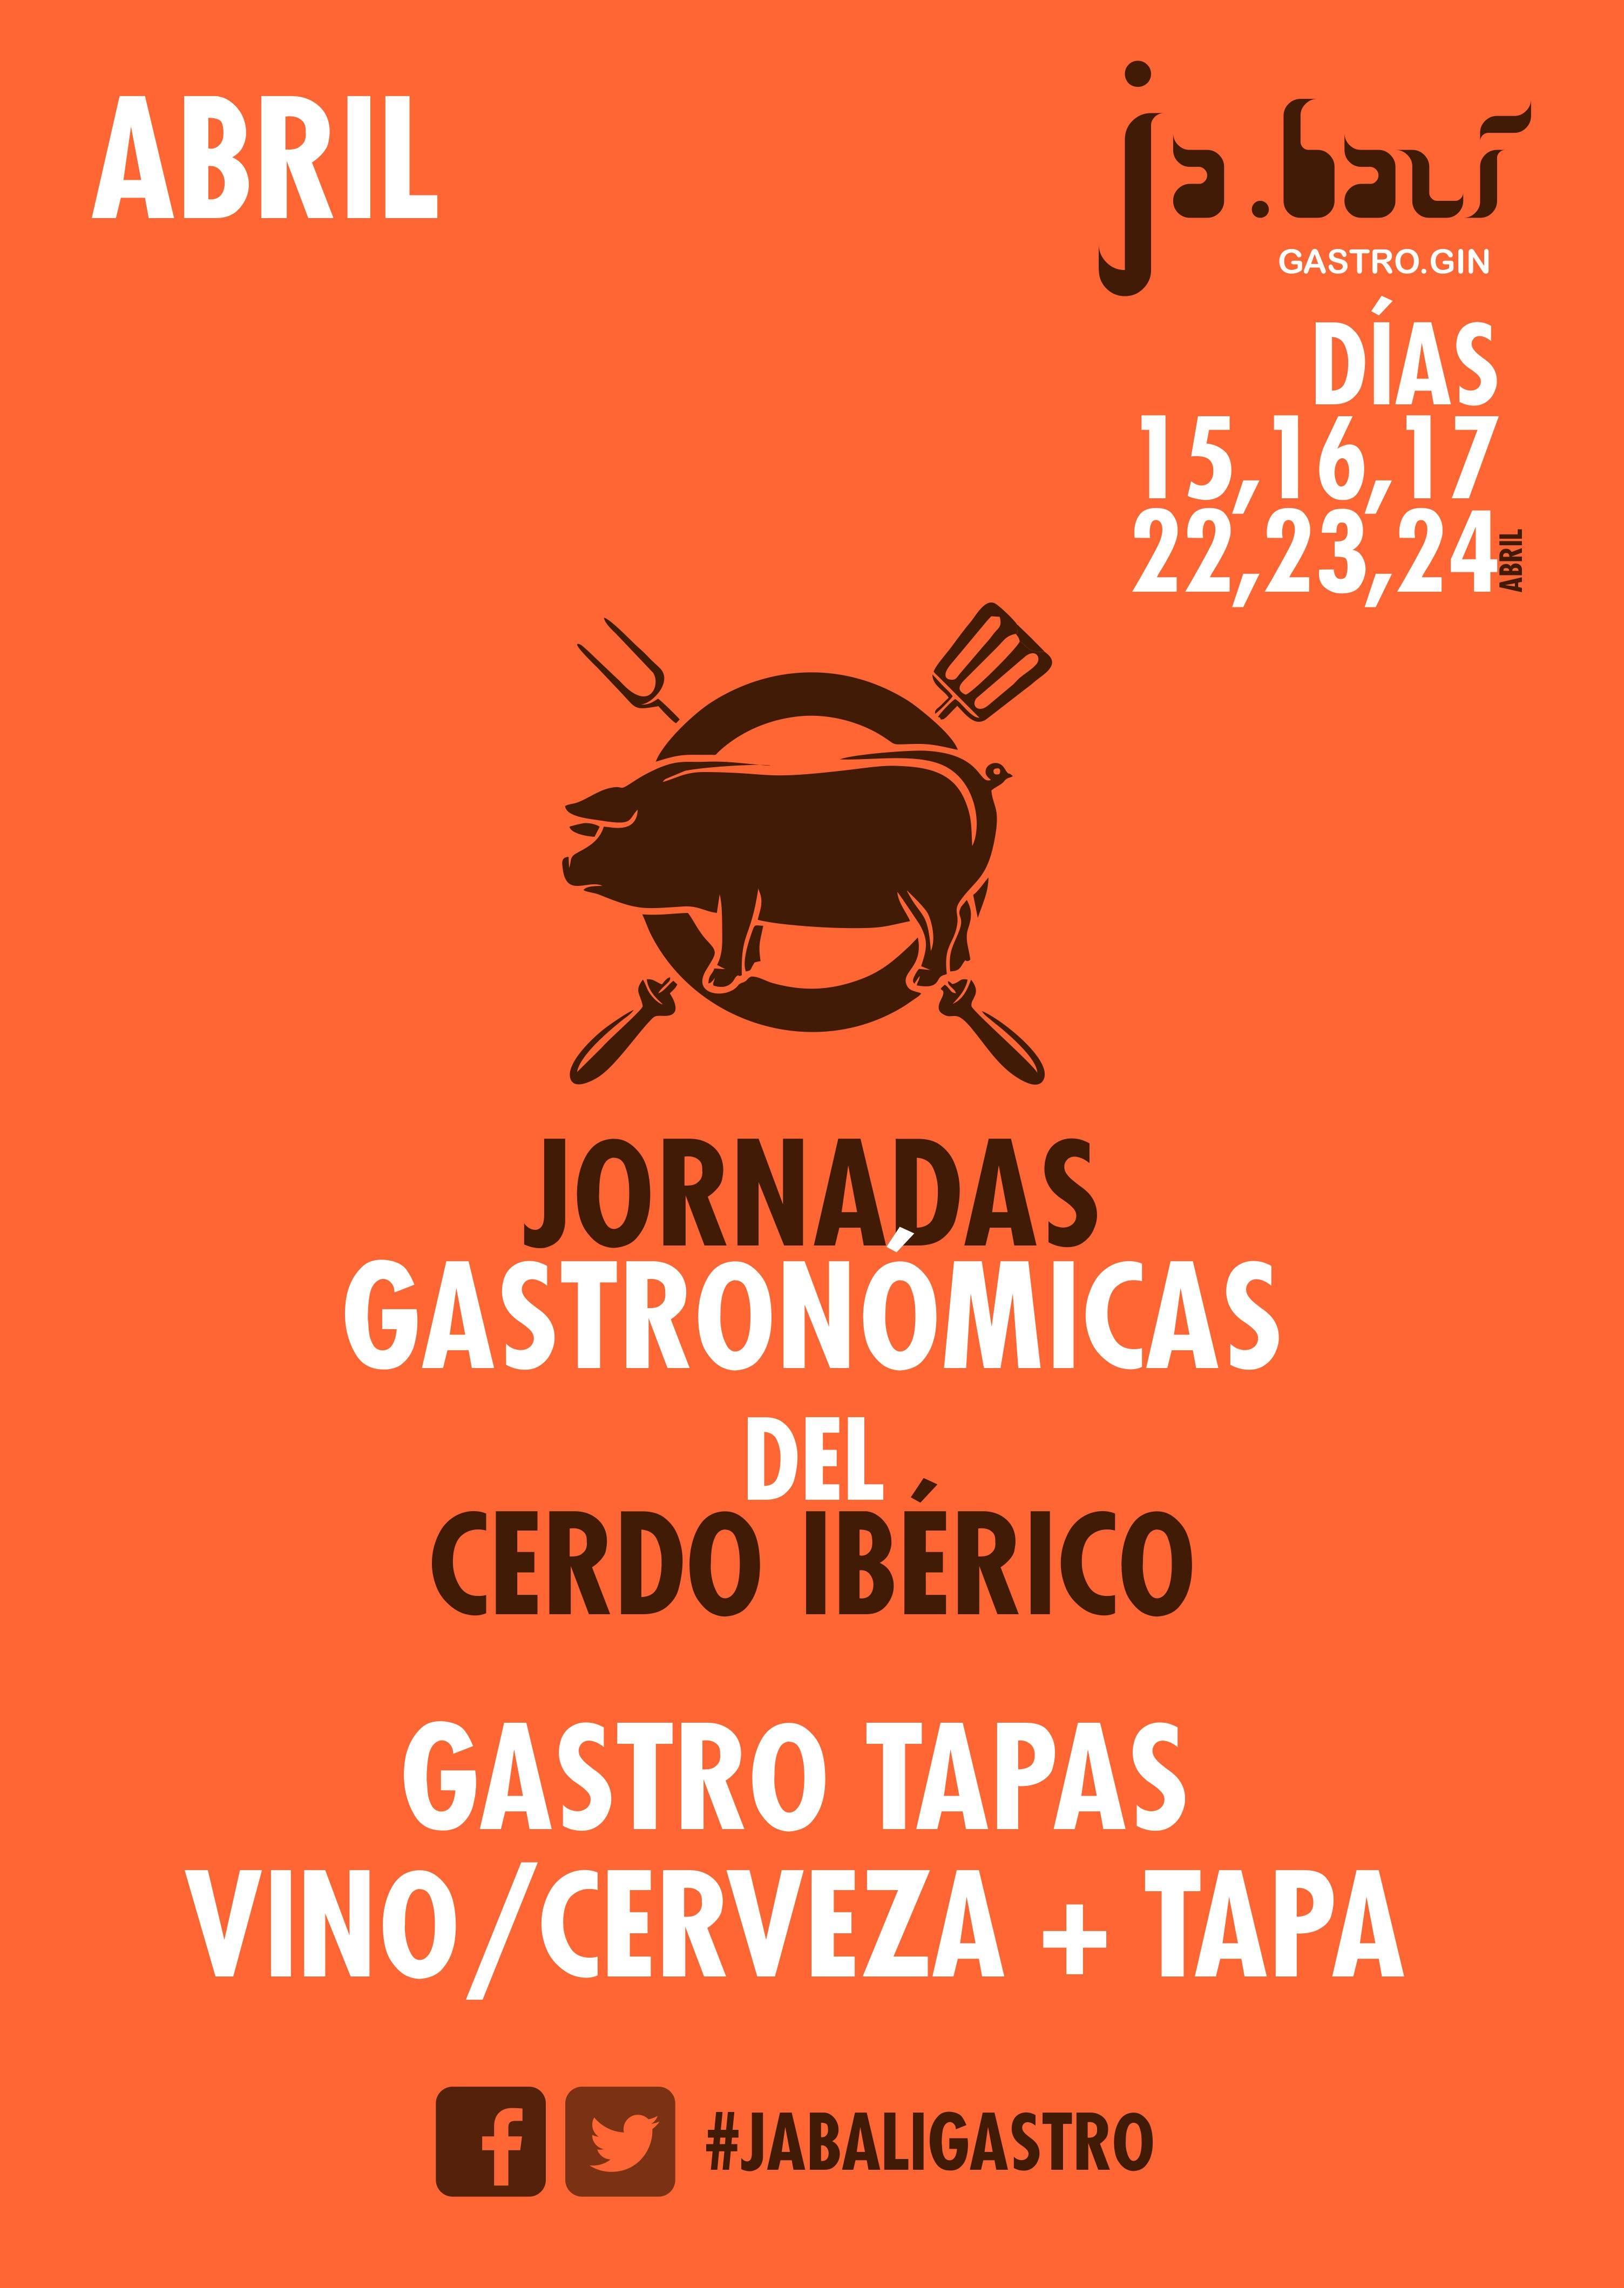 jornadas gastronomicas del cerdo iberico